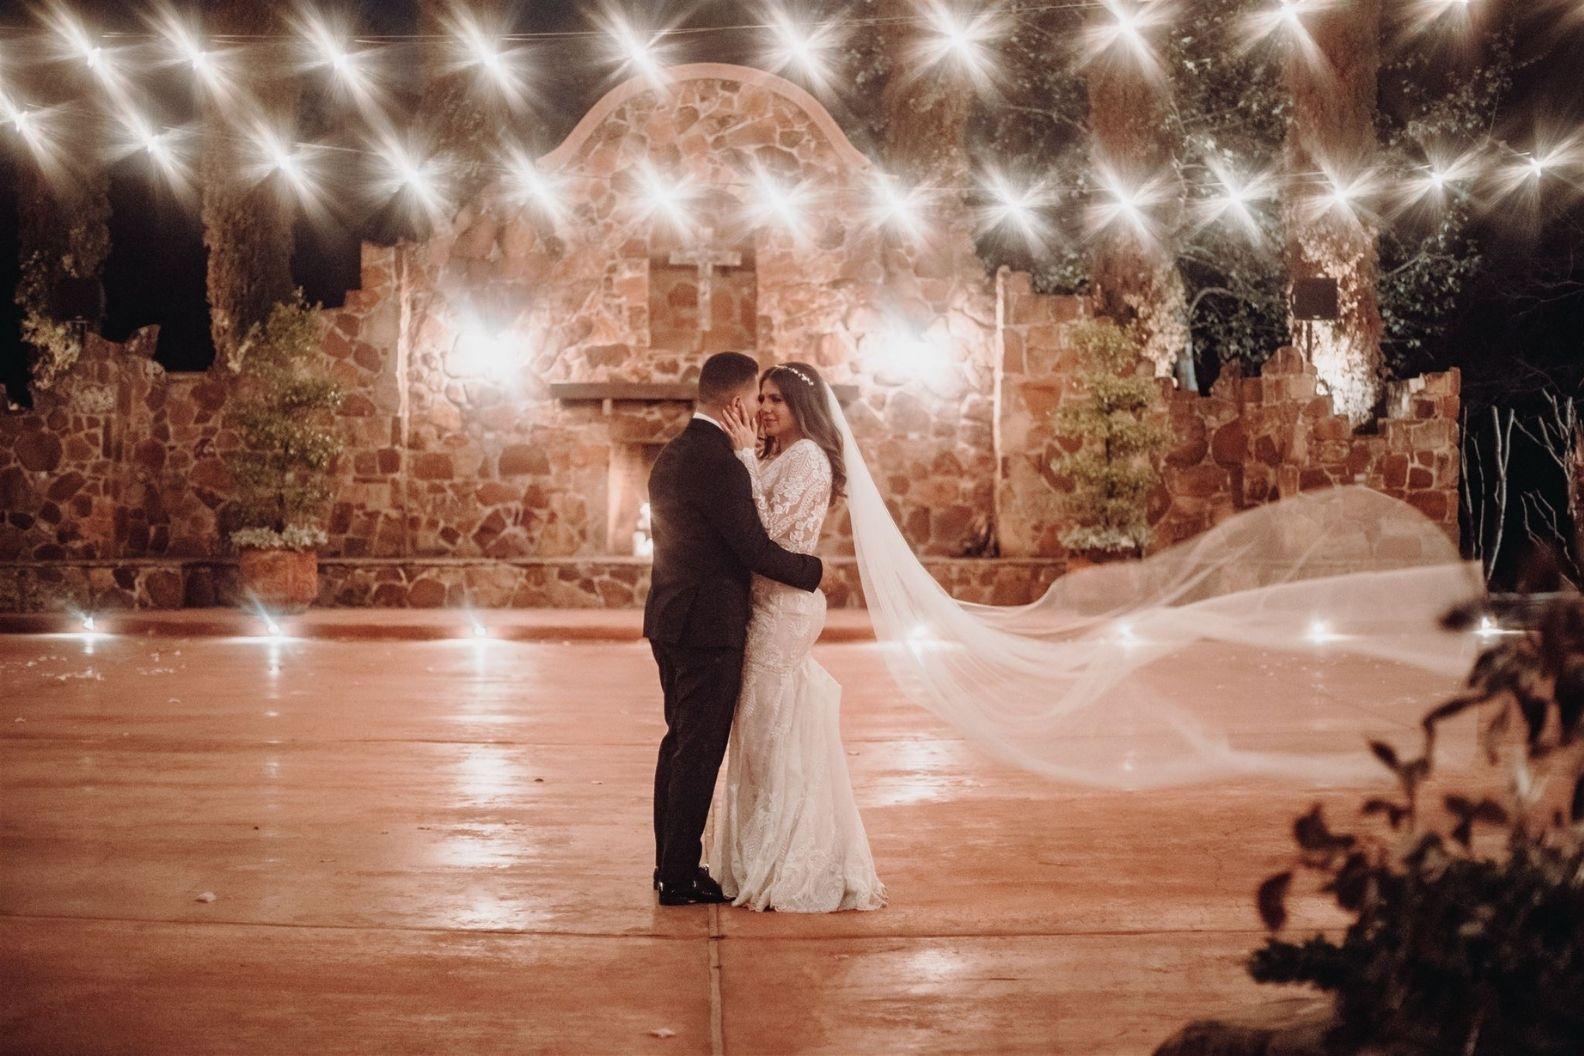 24 Samantha and Mario - Madera Estates Conroe Texas - Twilight Evening Outdoor Ceremony